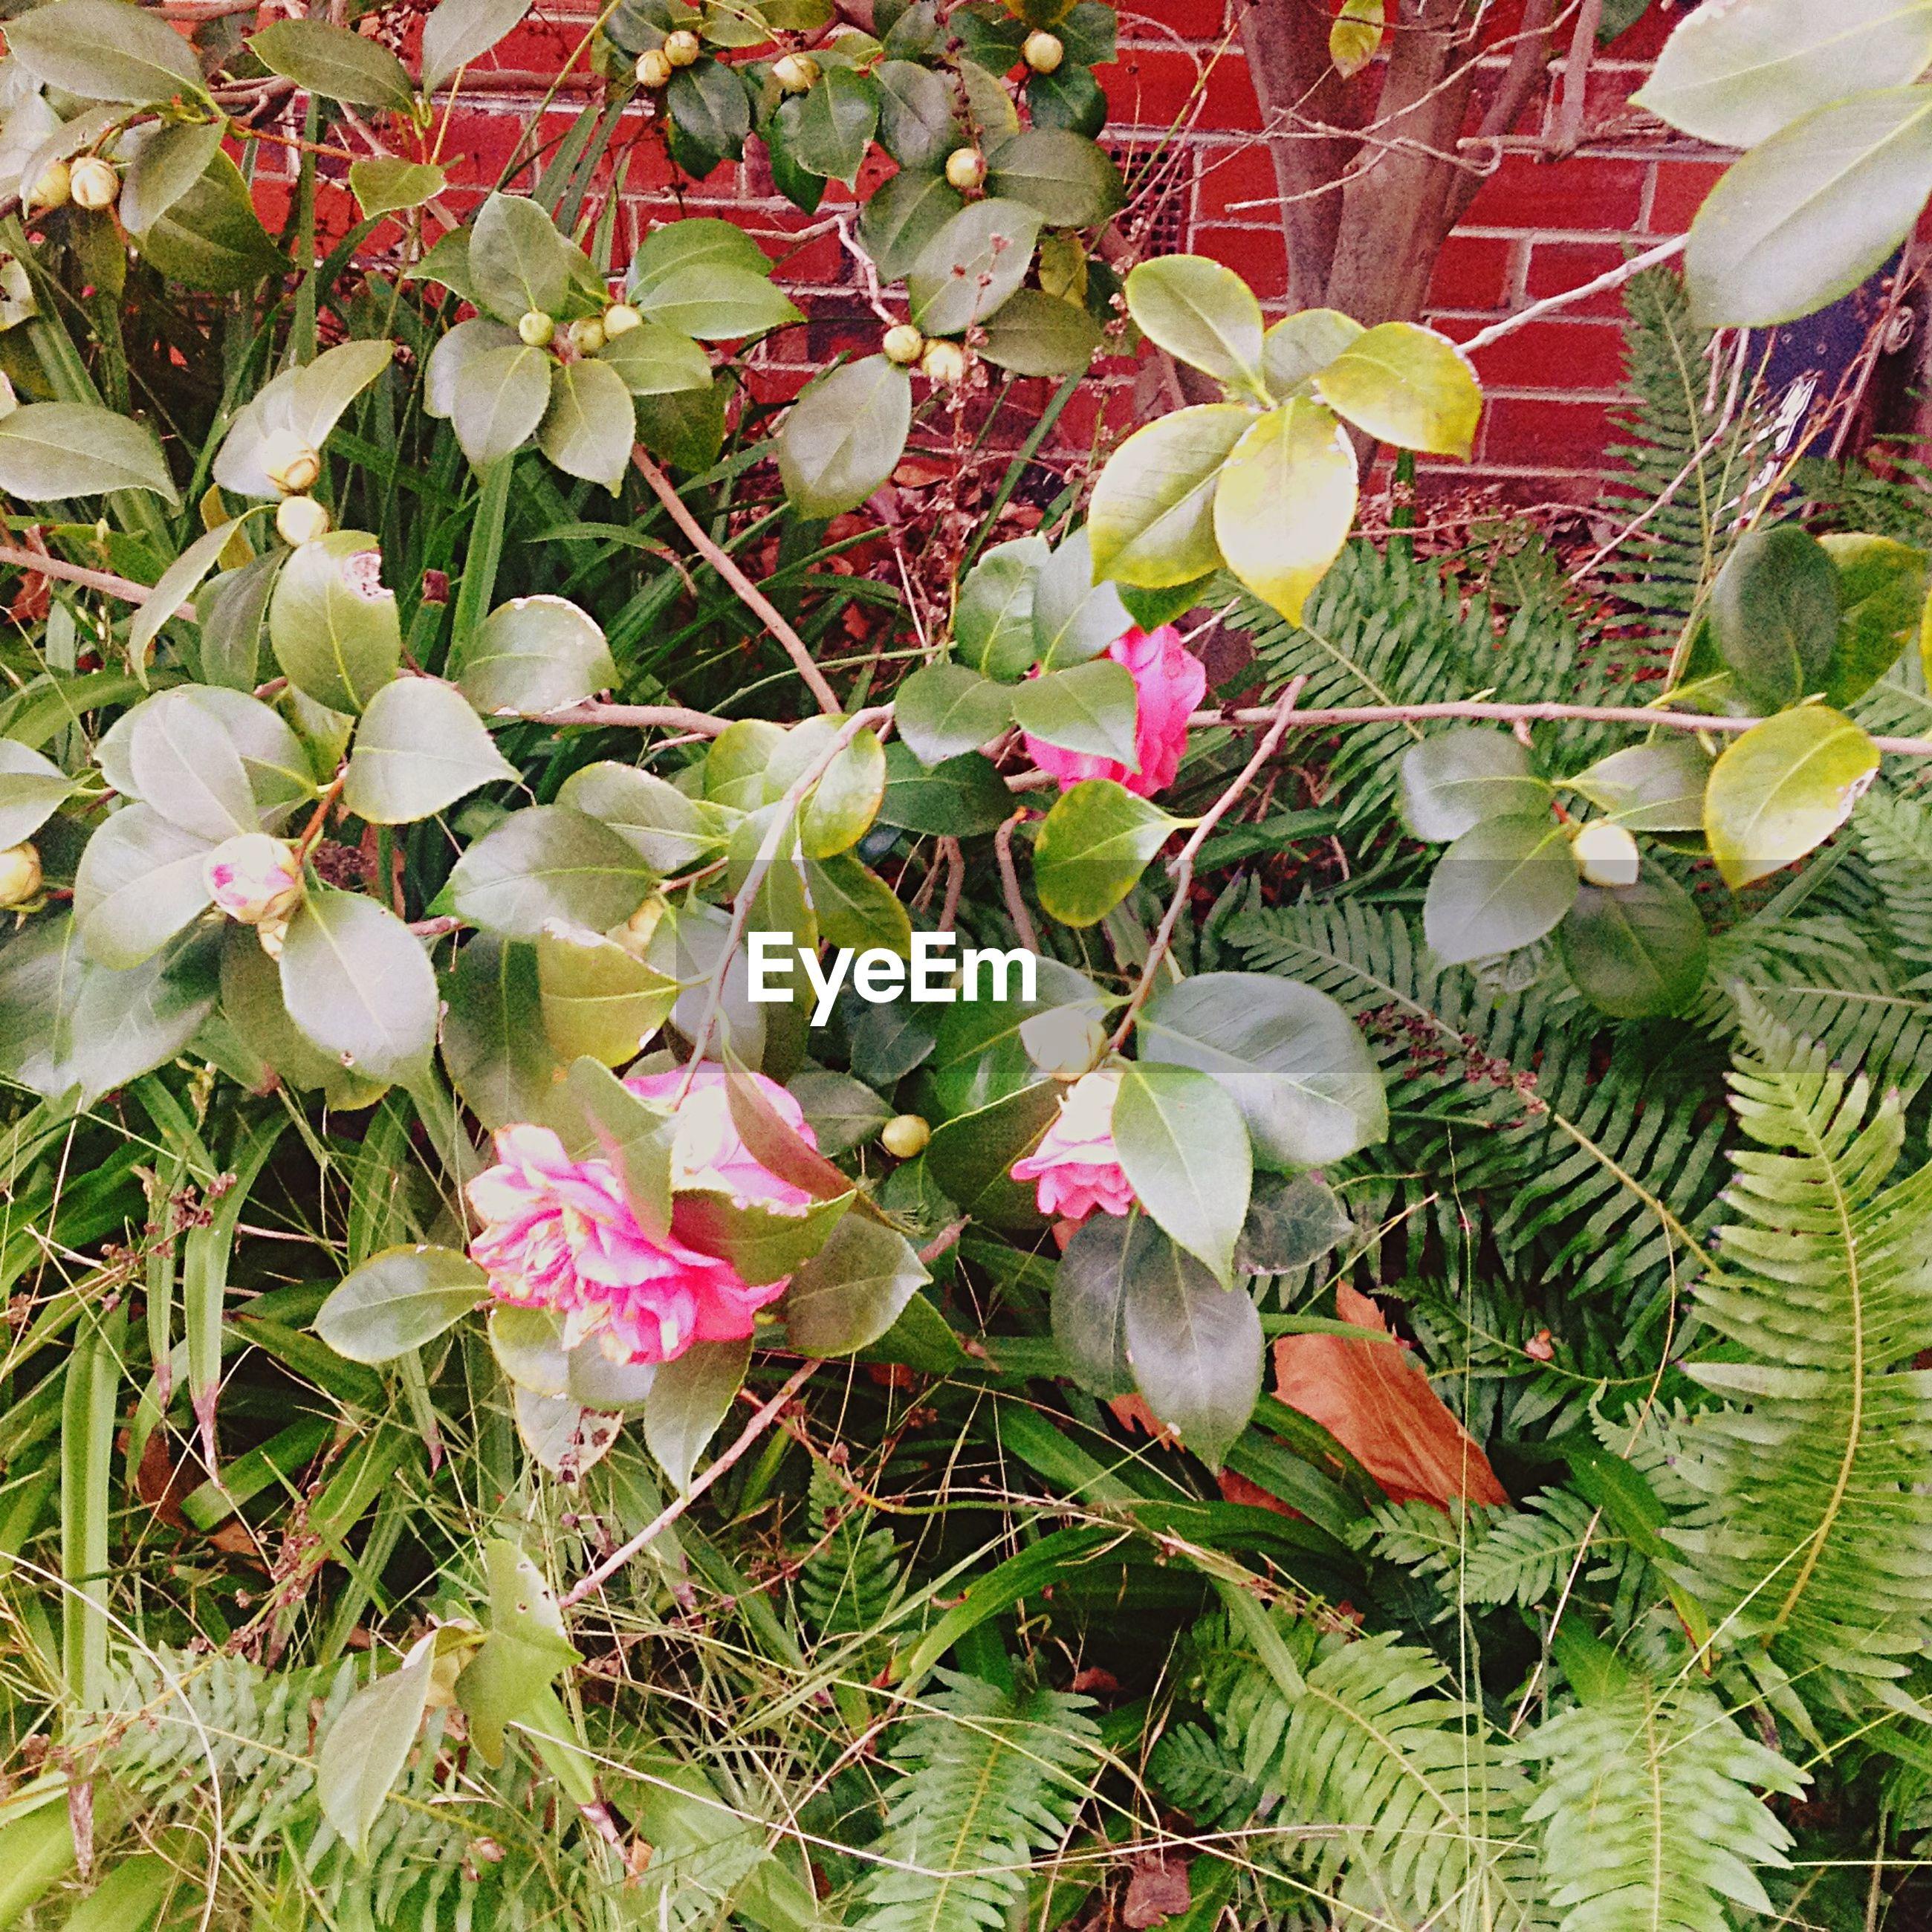 Plants growing outside house in yard